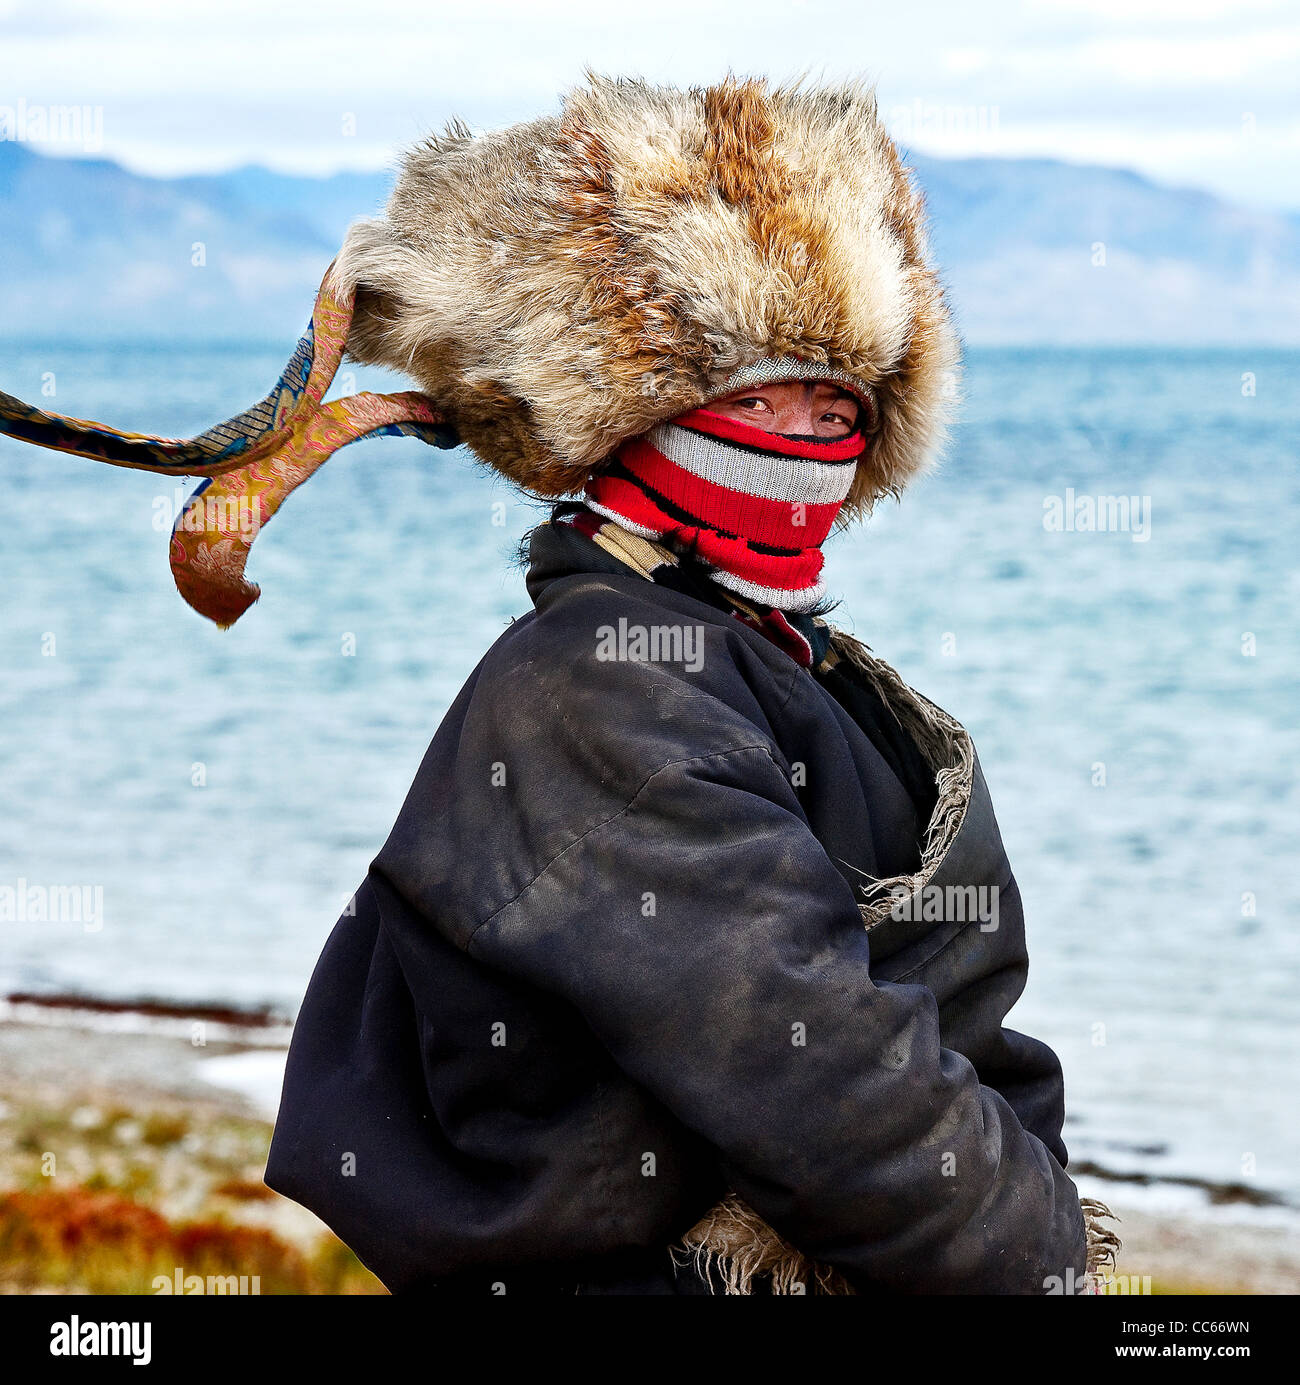 Uomo tibetano in costume tradizionale accanto al lago Yumco Tangra, Ngari, Tibet, Cina Immagini Stock